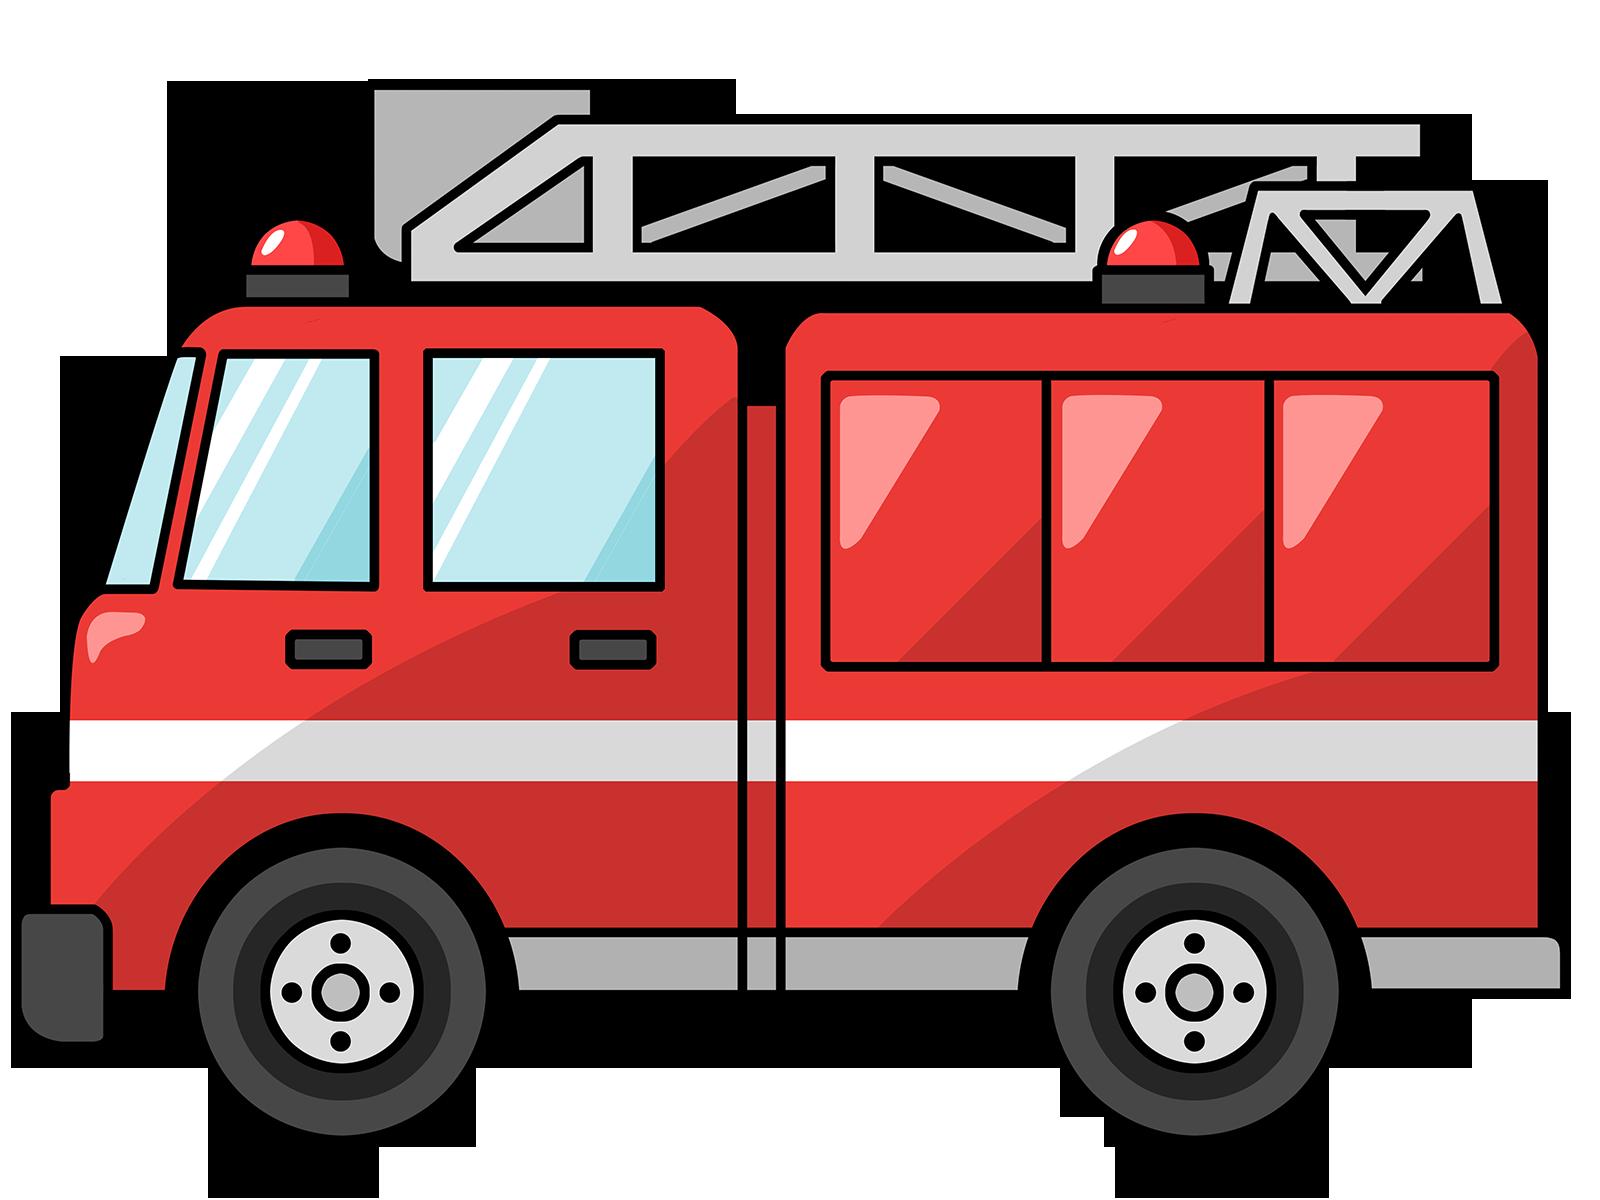 fire truck clipart - Google Search - PNG Fire Truck